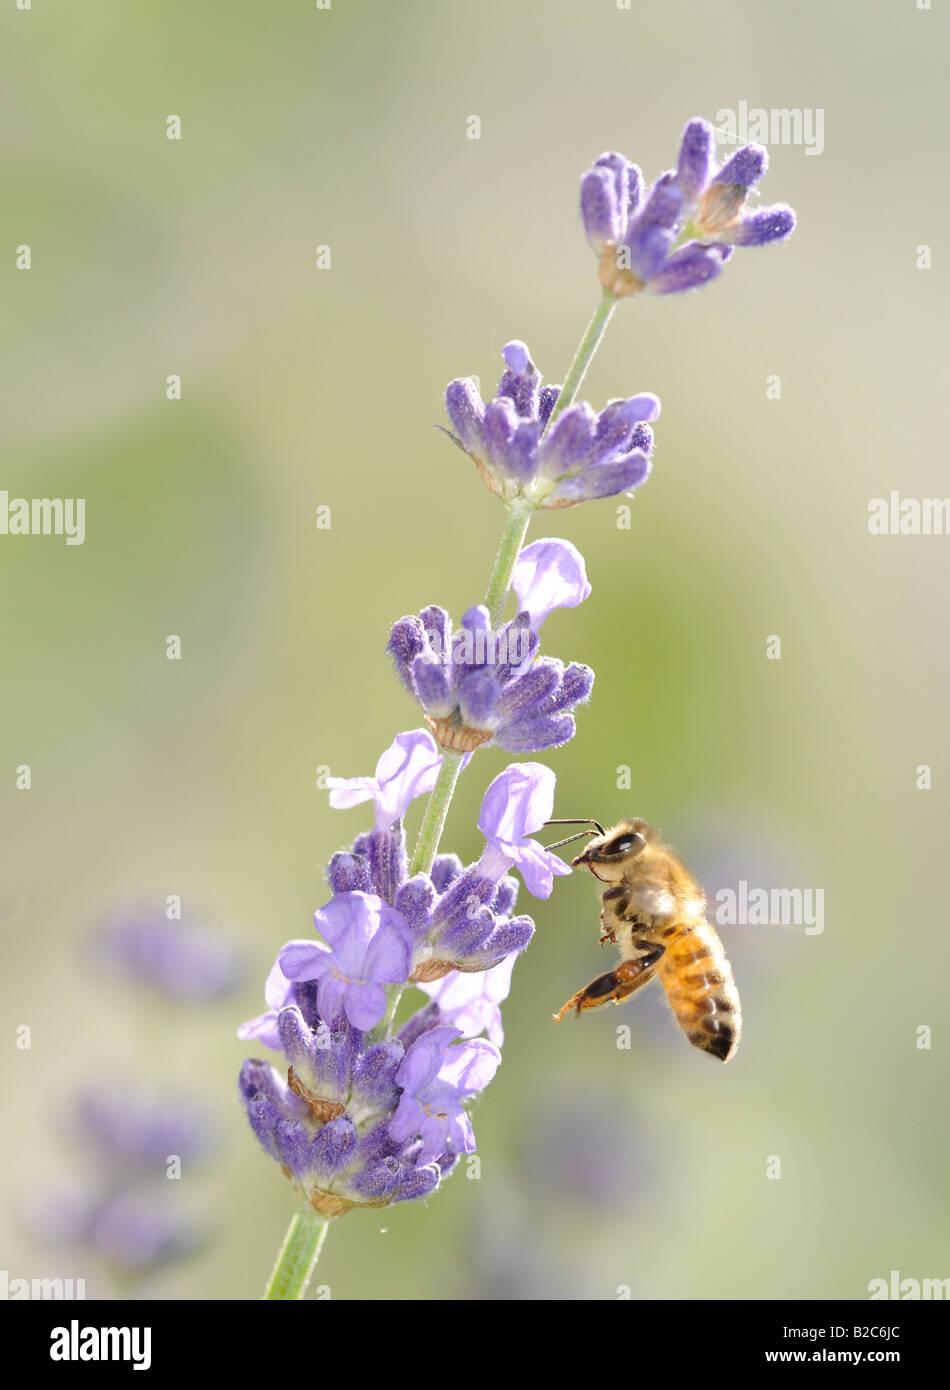 Honey bee (Apis) on Lavender (Lavandula angustifolia) - Stock Image